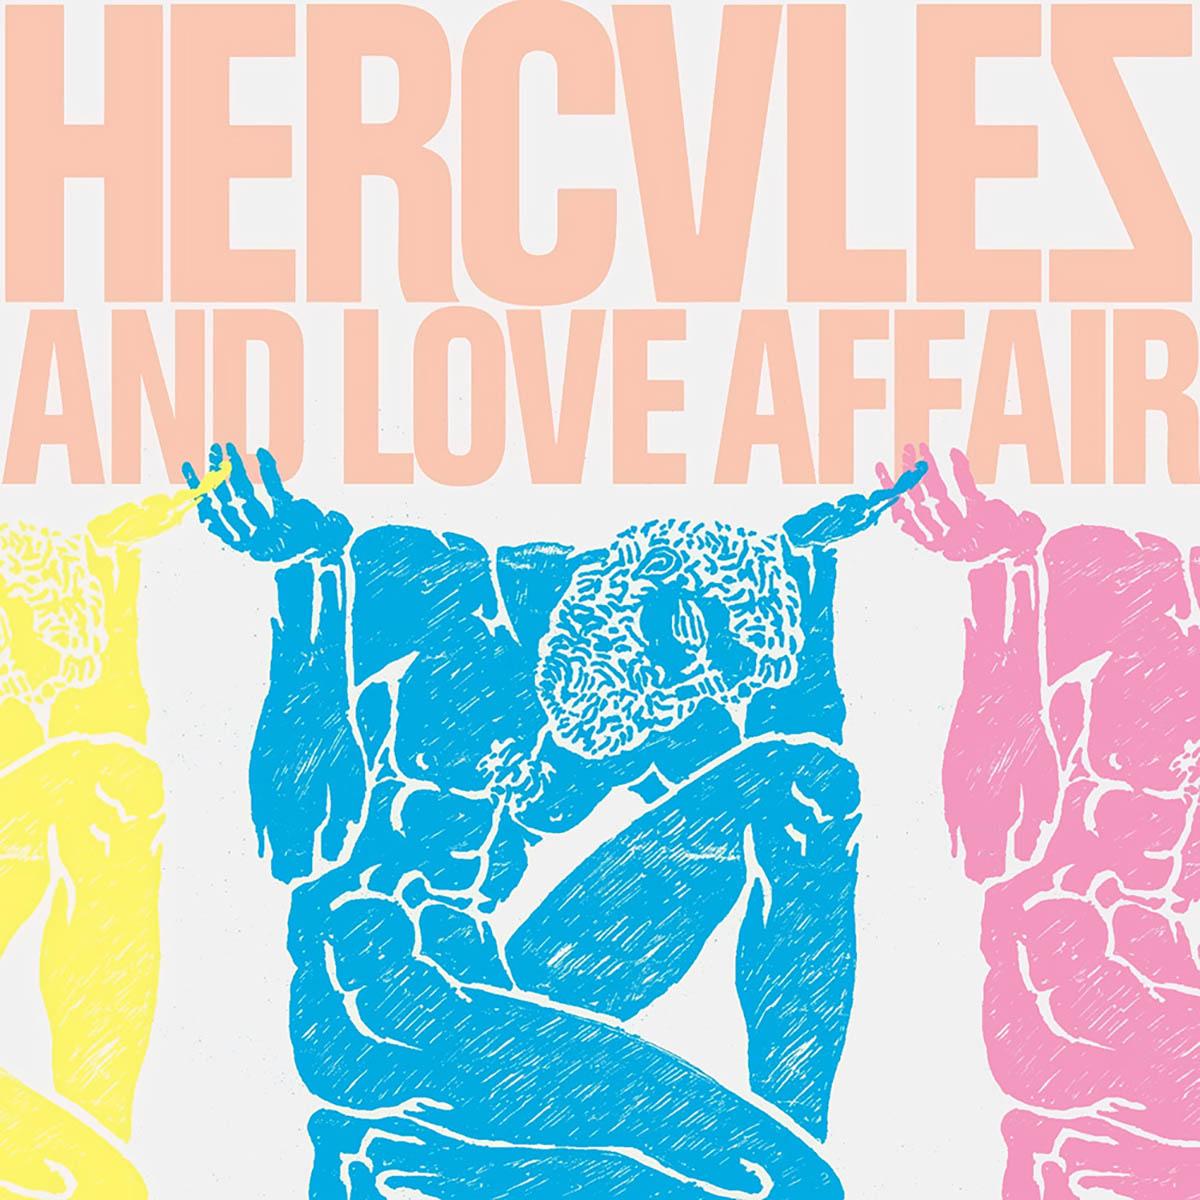 Hercules and Love Affair, Hercules and Love Affair